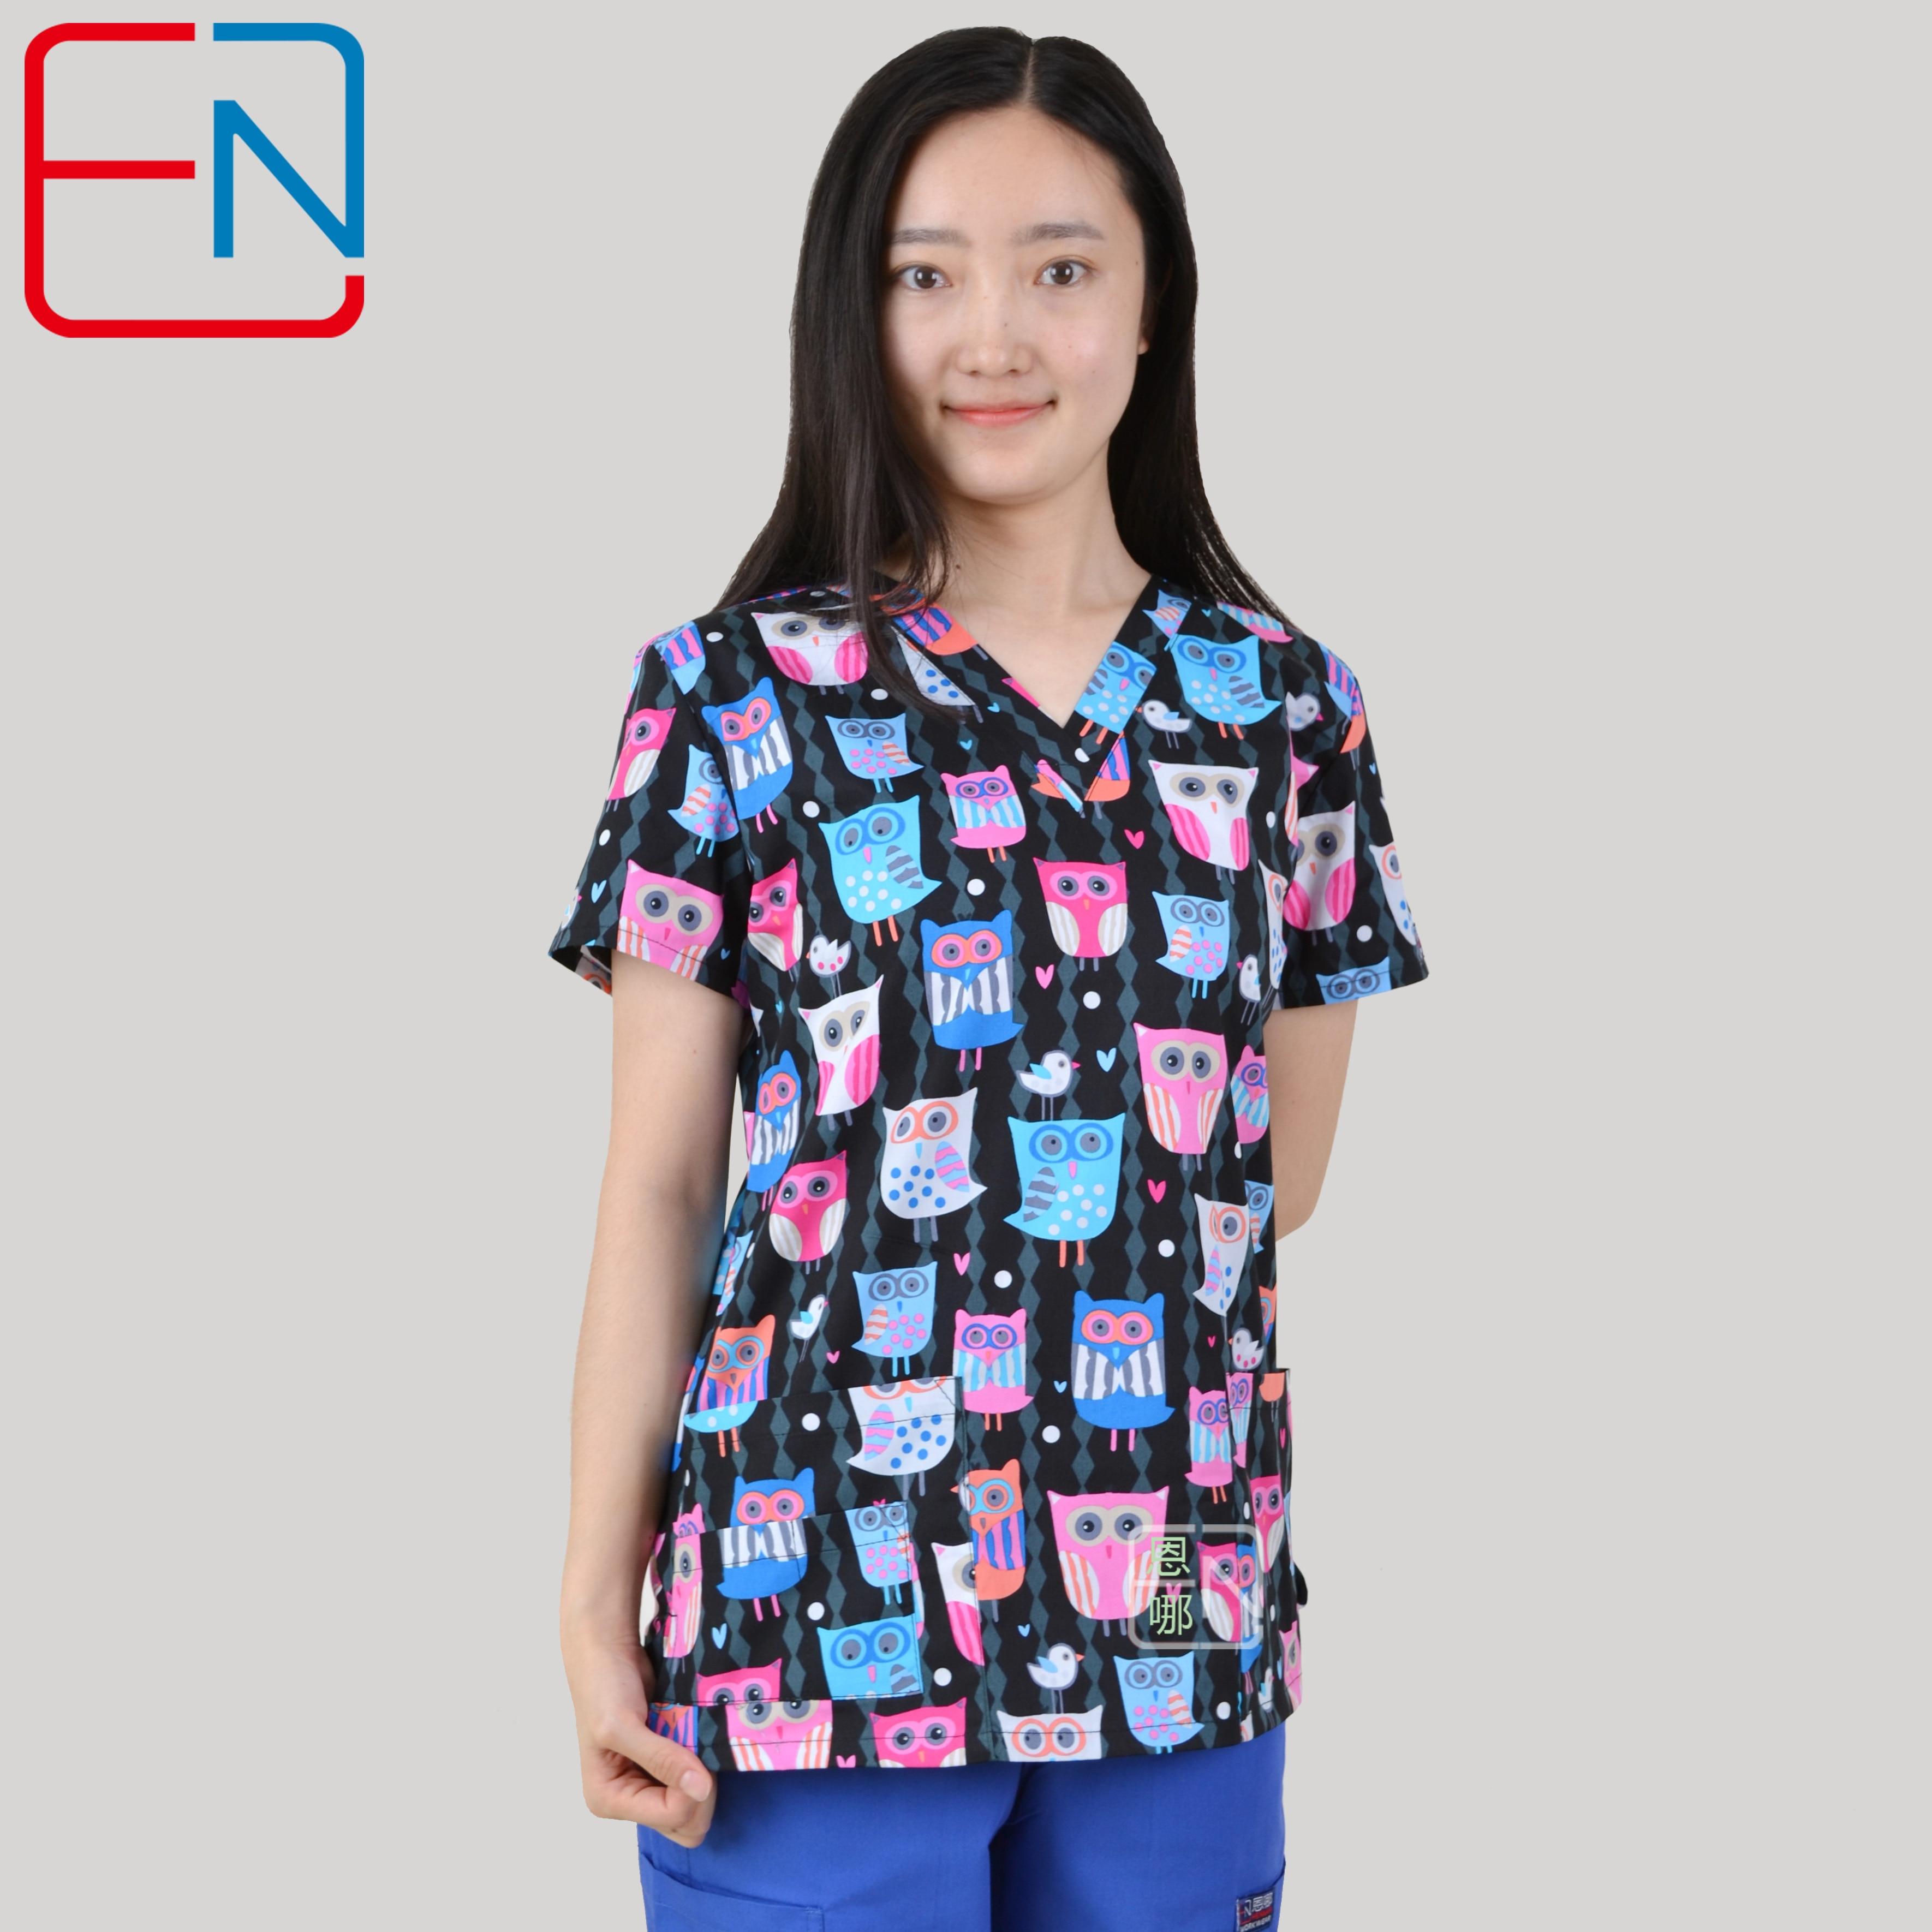 Image 3 - Brand medical scrub tops for women surgical scrubs,scrub uniform in 100% print cotton Chengse maotouyingScrub Tops & Bottoms   -